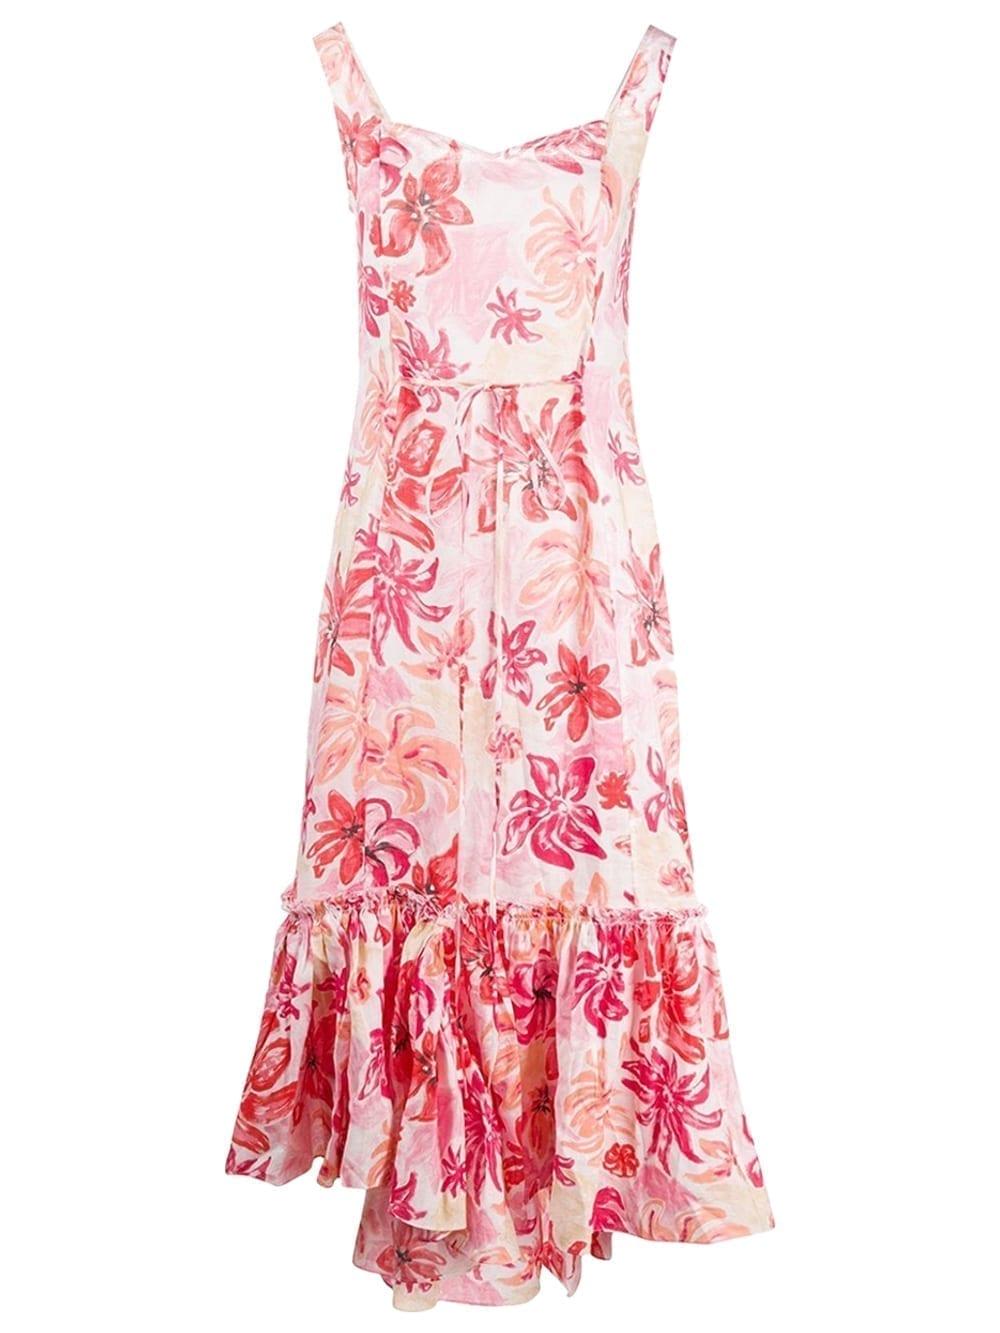 MARNI Pink Tropical Flower Print Dress